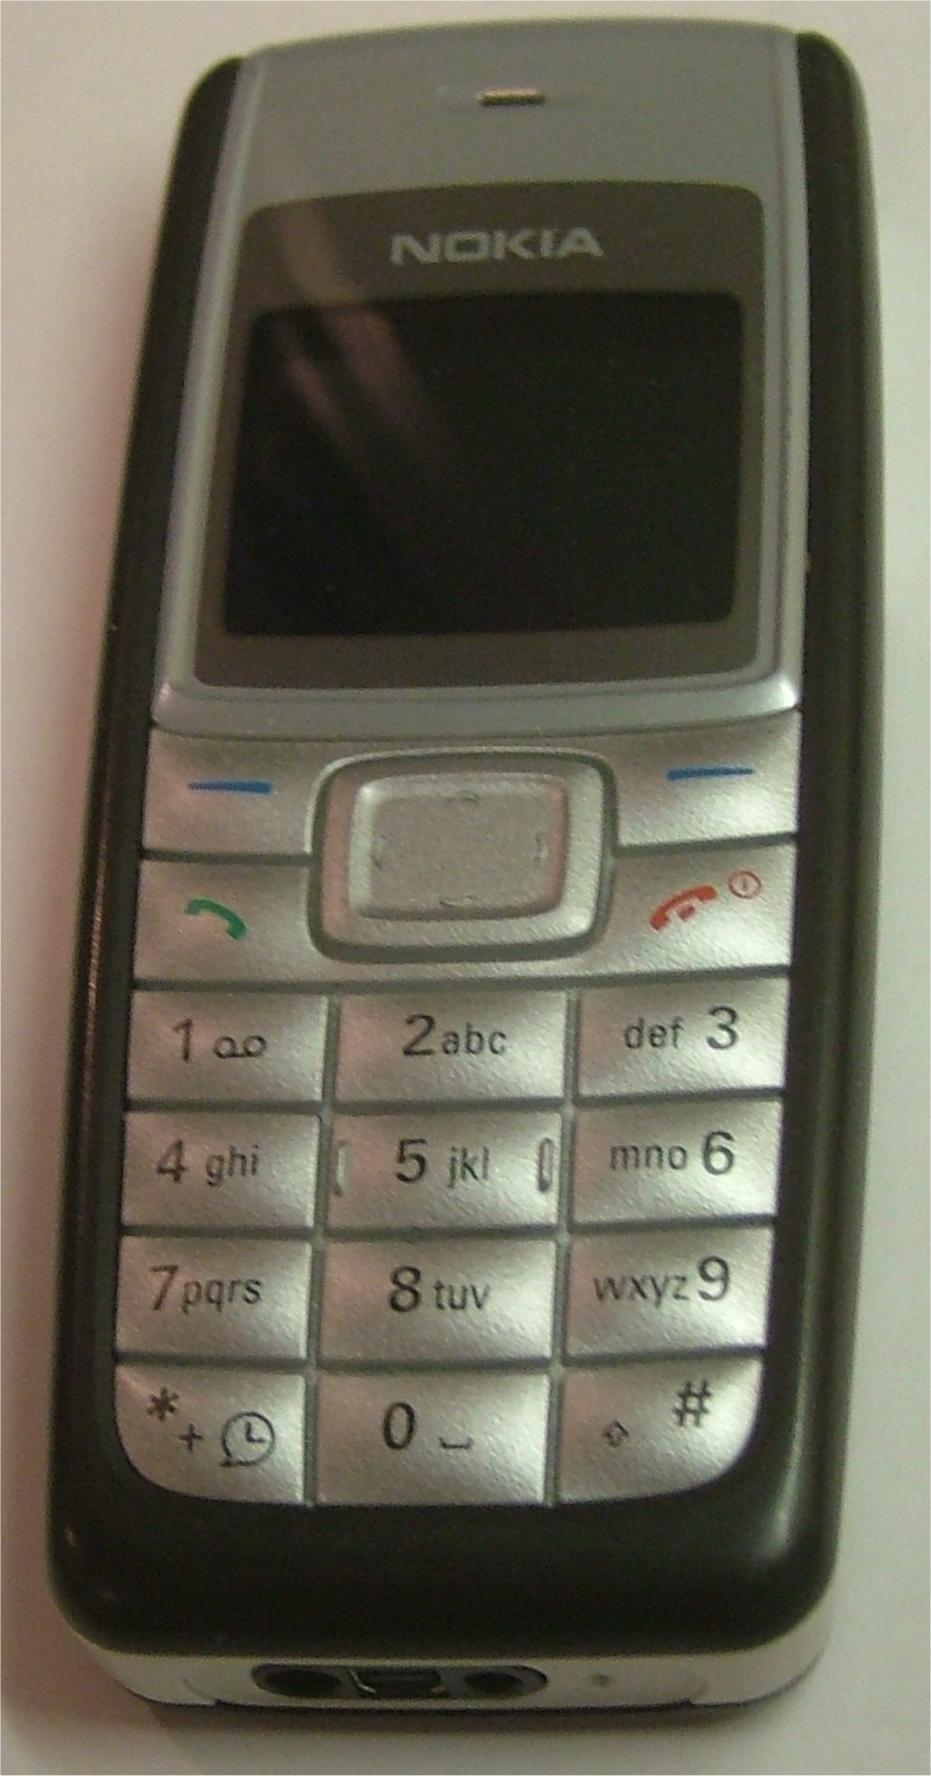 https://i0.wp.com/upload.wikimedia.org/wikipedia/commons/7/70/Nokia_1110_DG_01.jpg